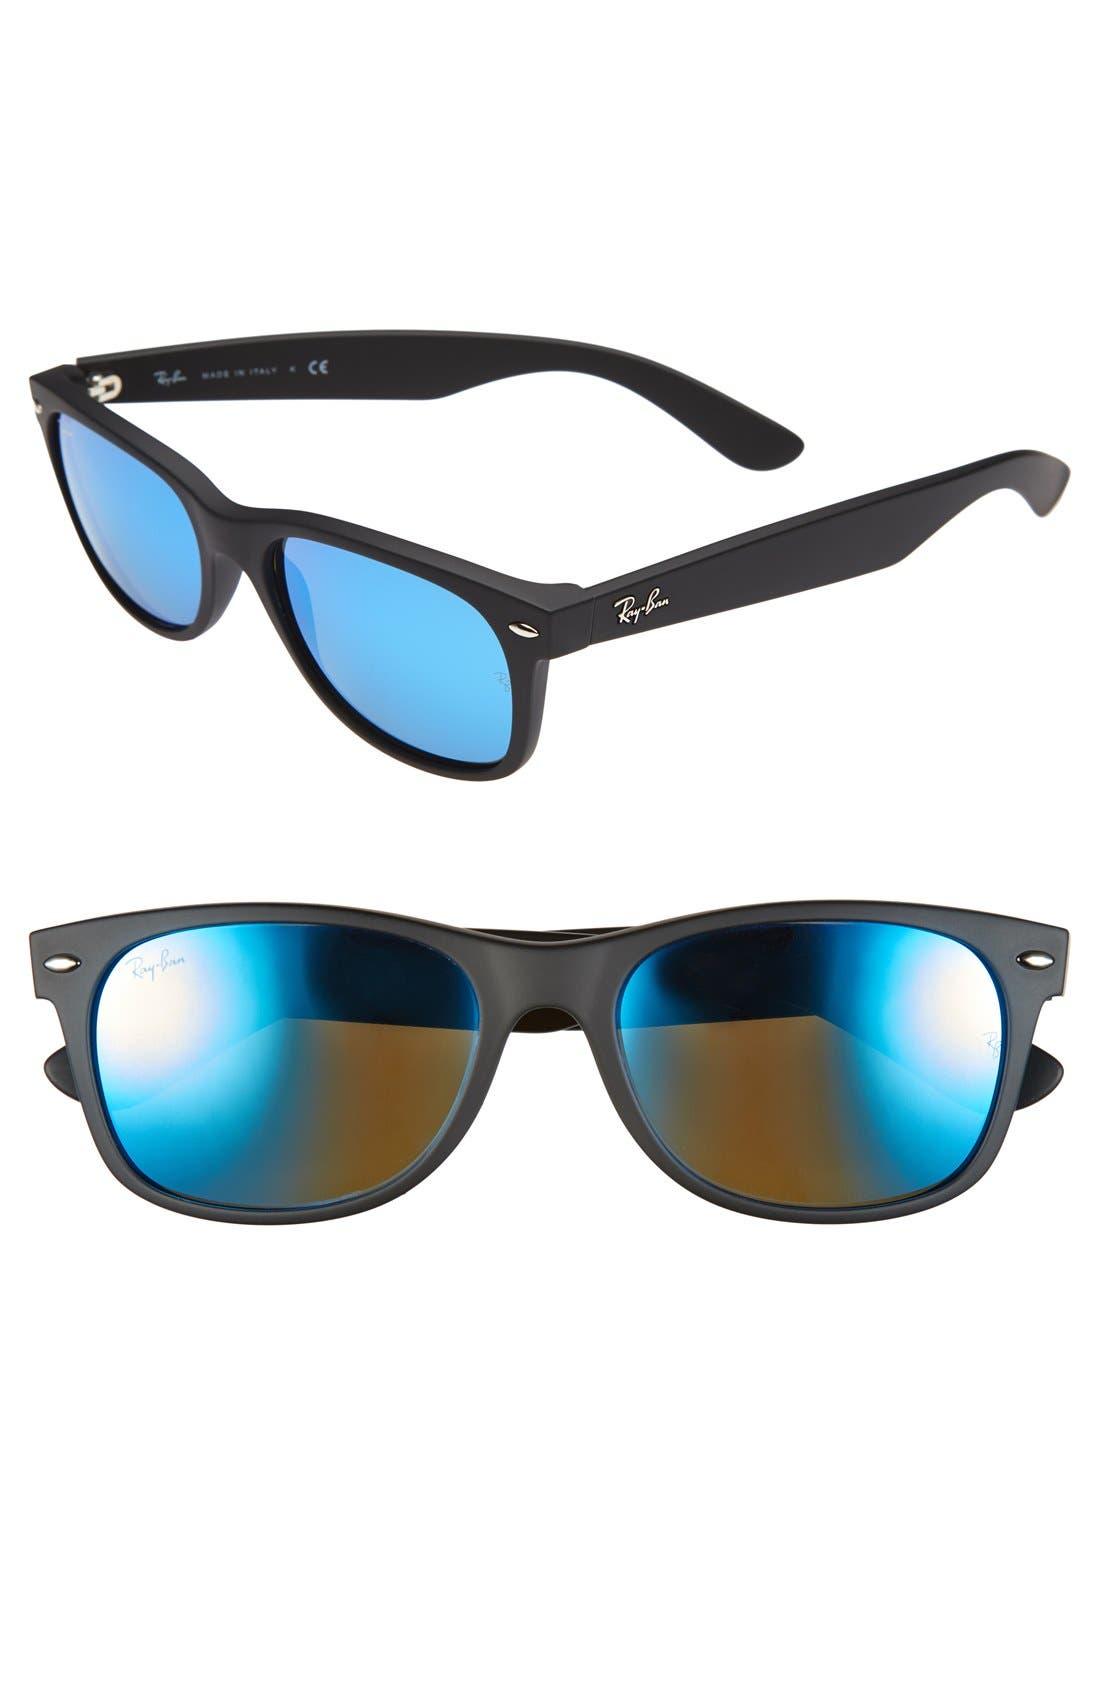 Main Image - Ray-Ban 'New Wayfarer' 55mm Sunglasses